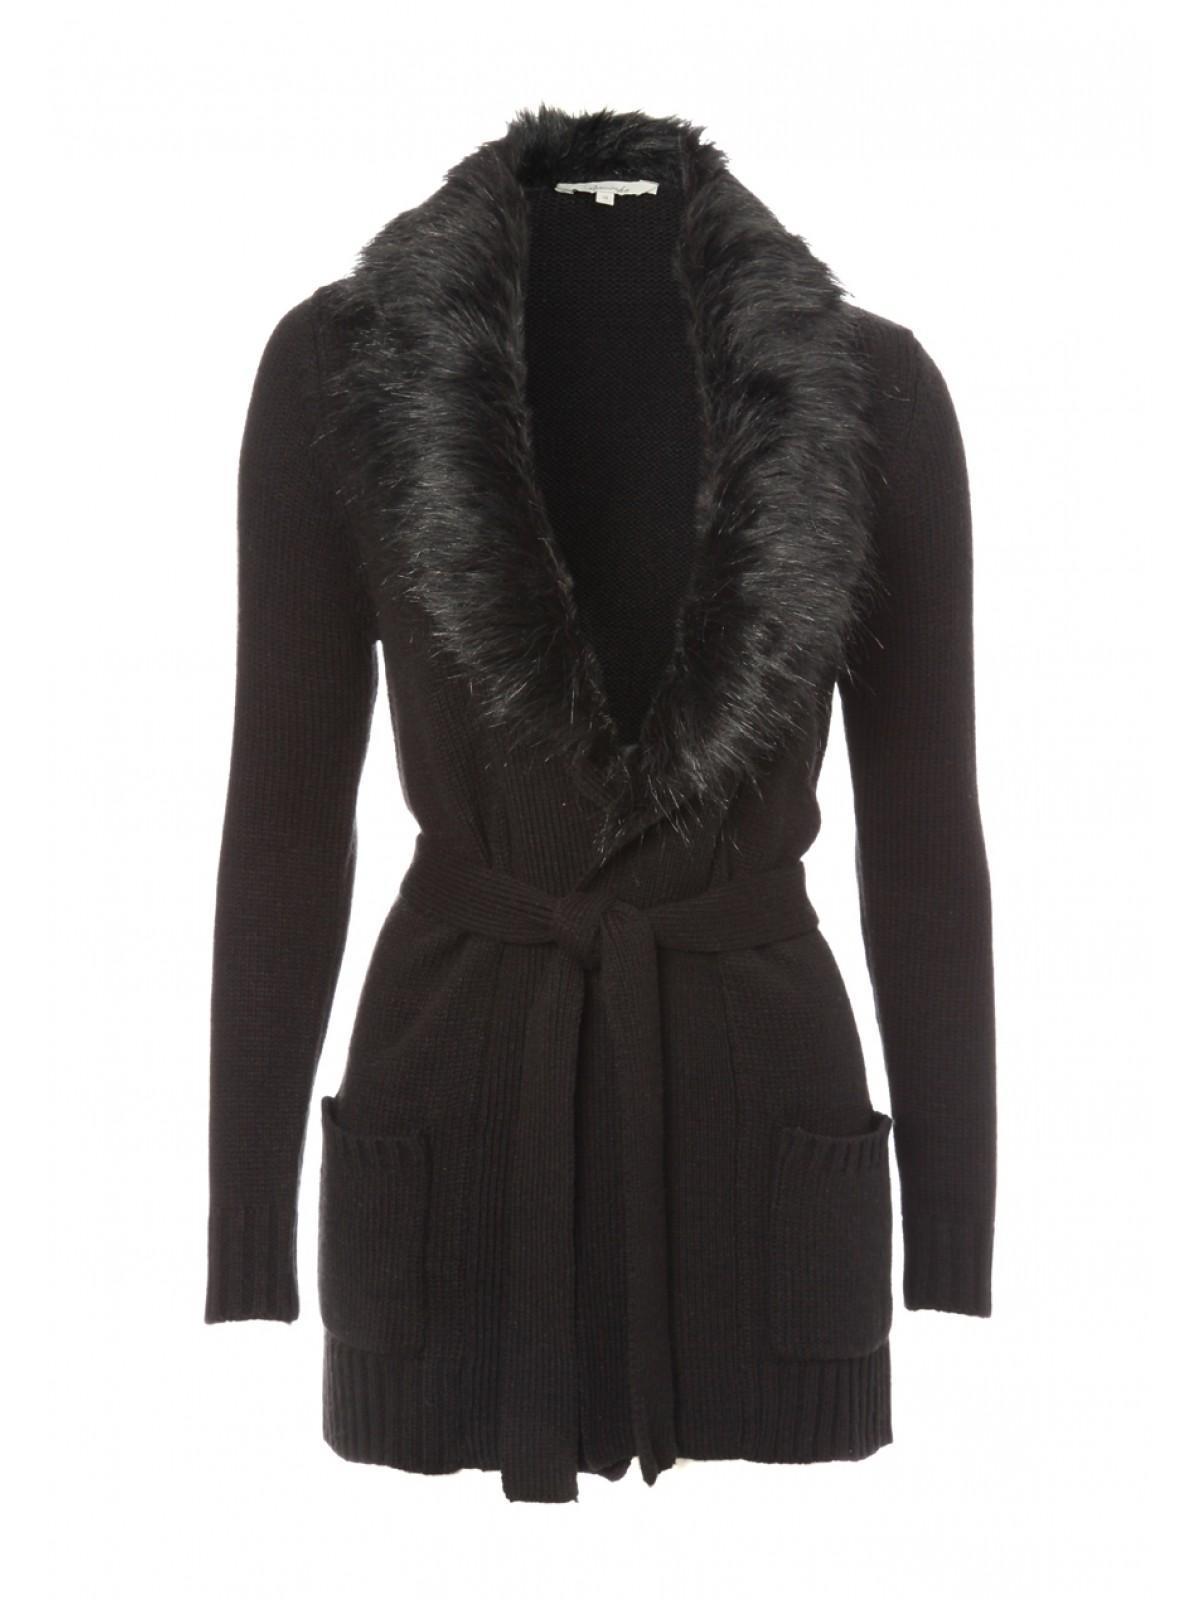 Womens Faux Fur Collar Cardigan | Peacocks